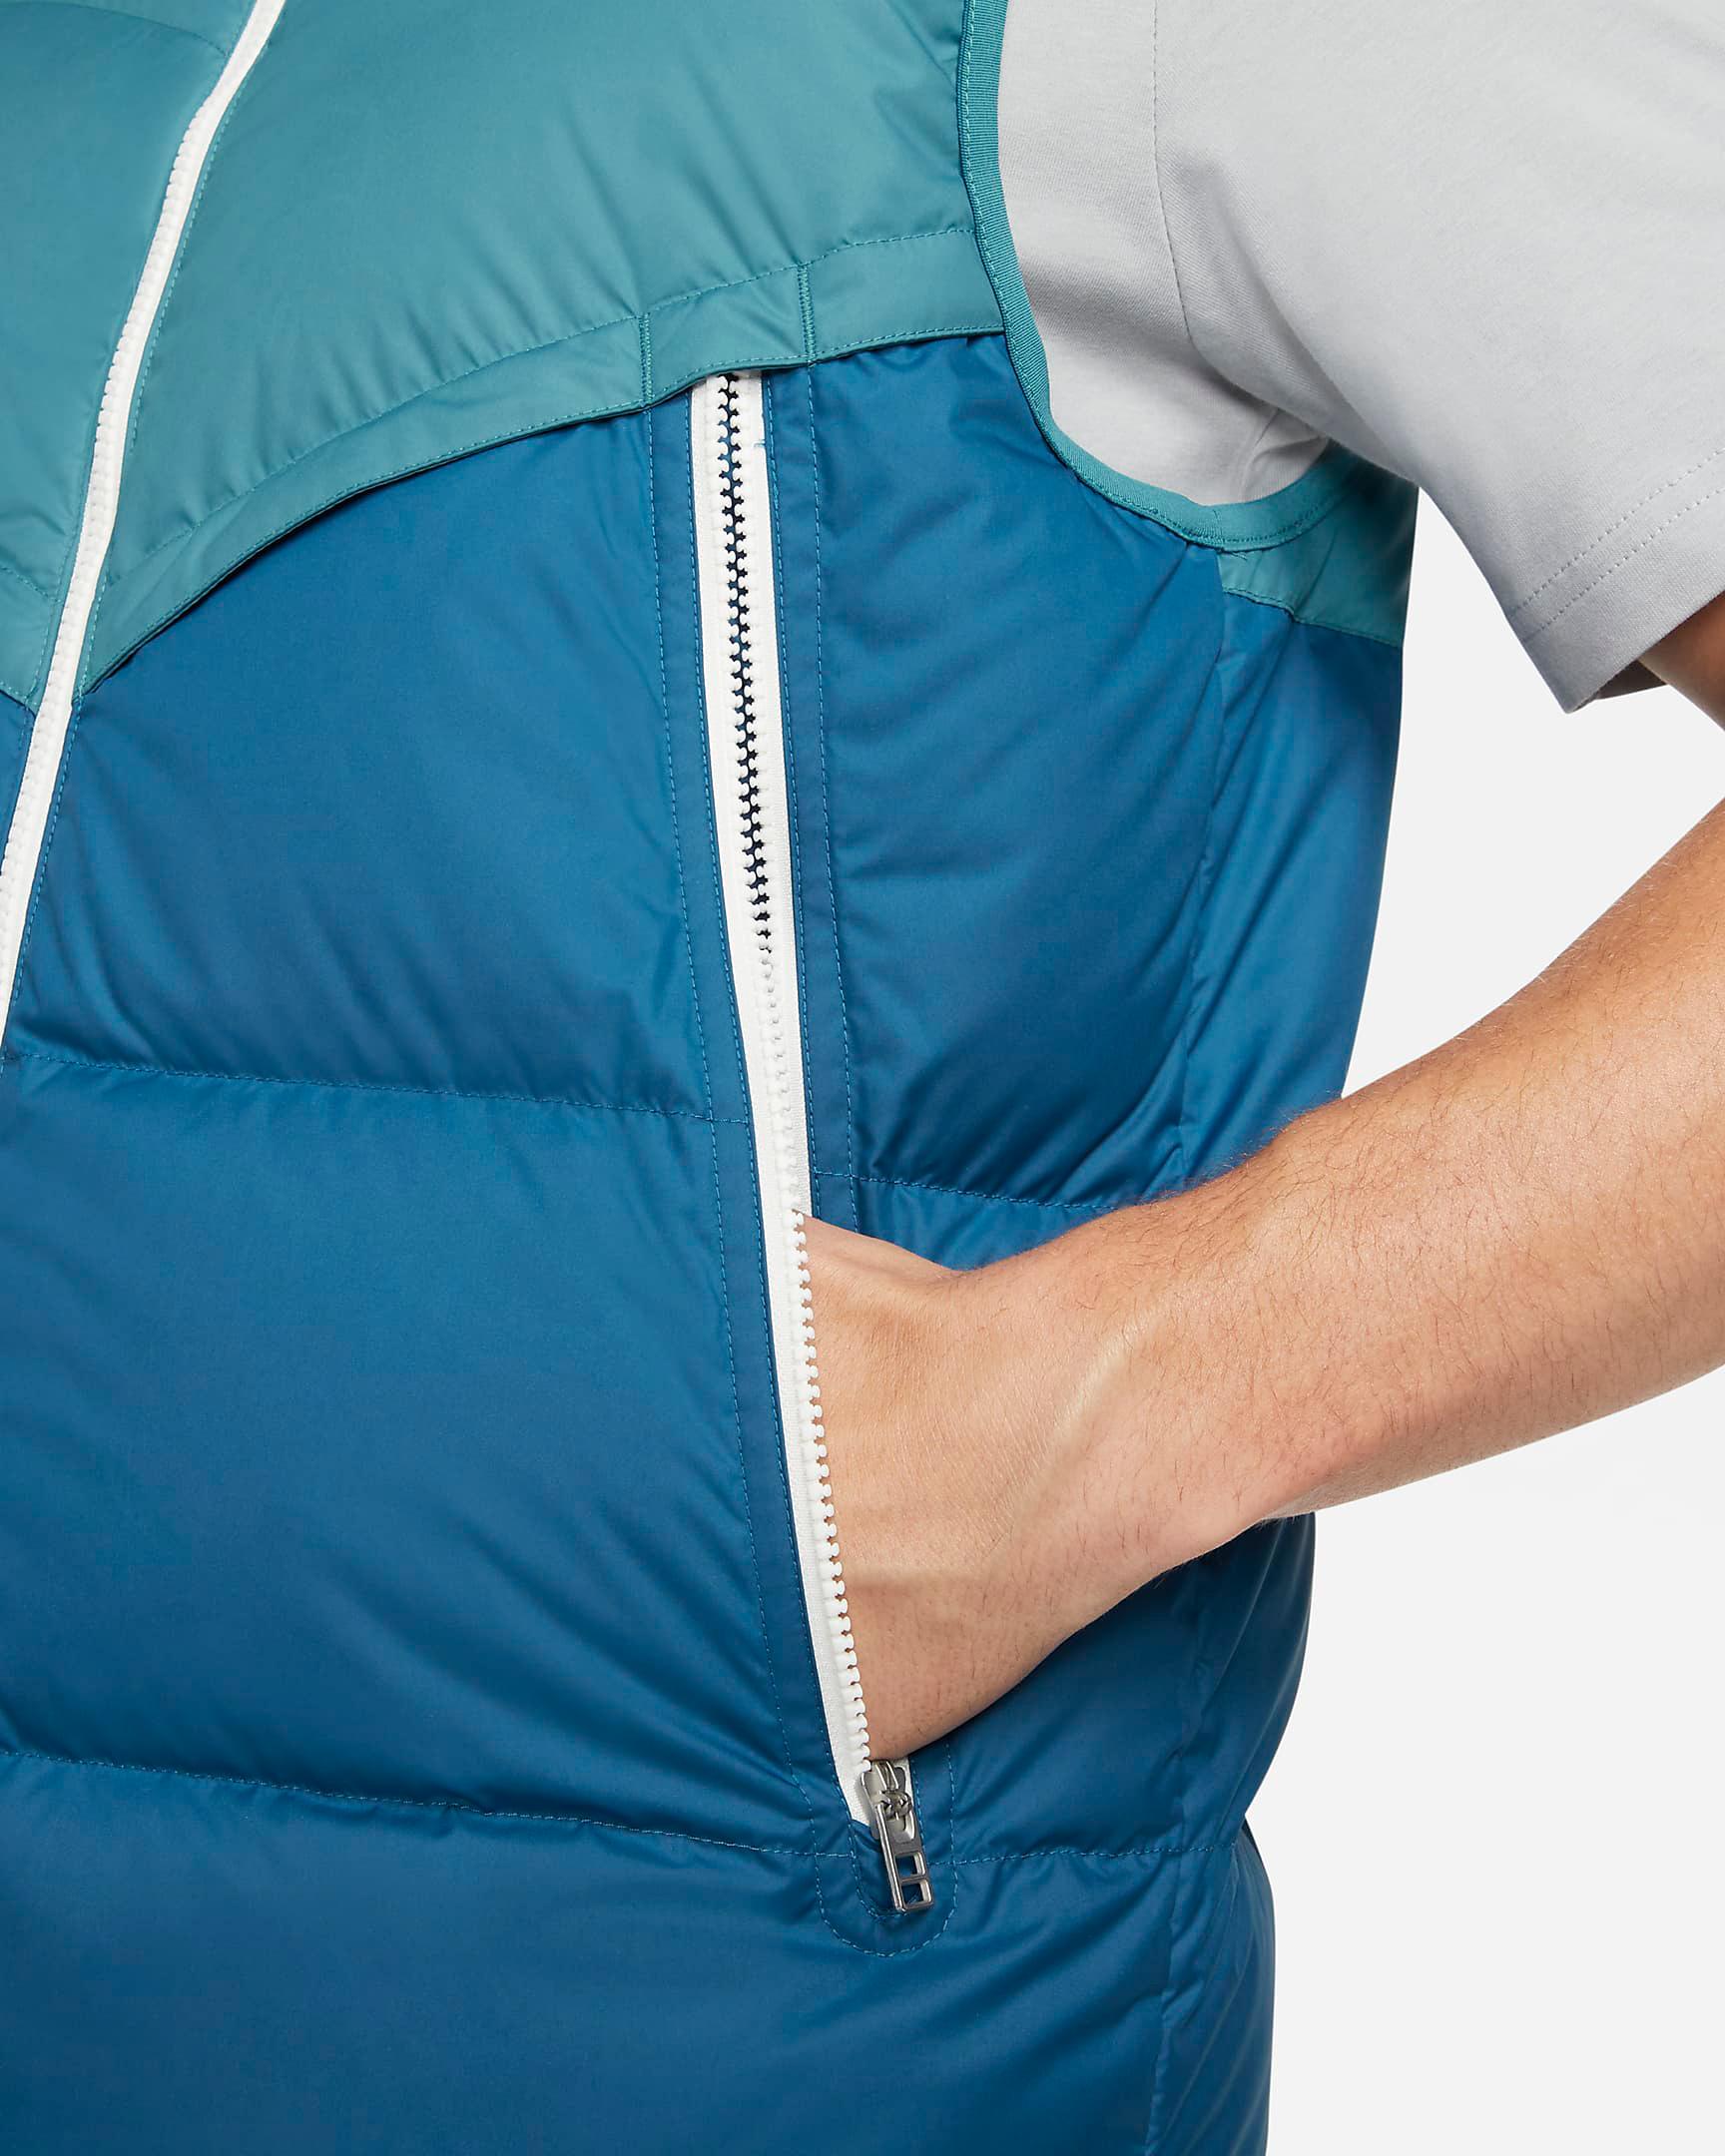 nike-sportswear-storm-fit-windrunner-vest-jacket-rift-blue-court-blue-sail-4